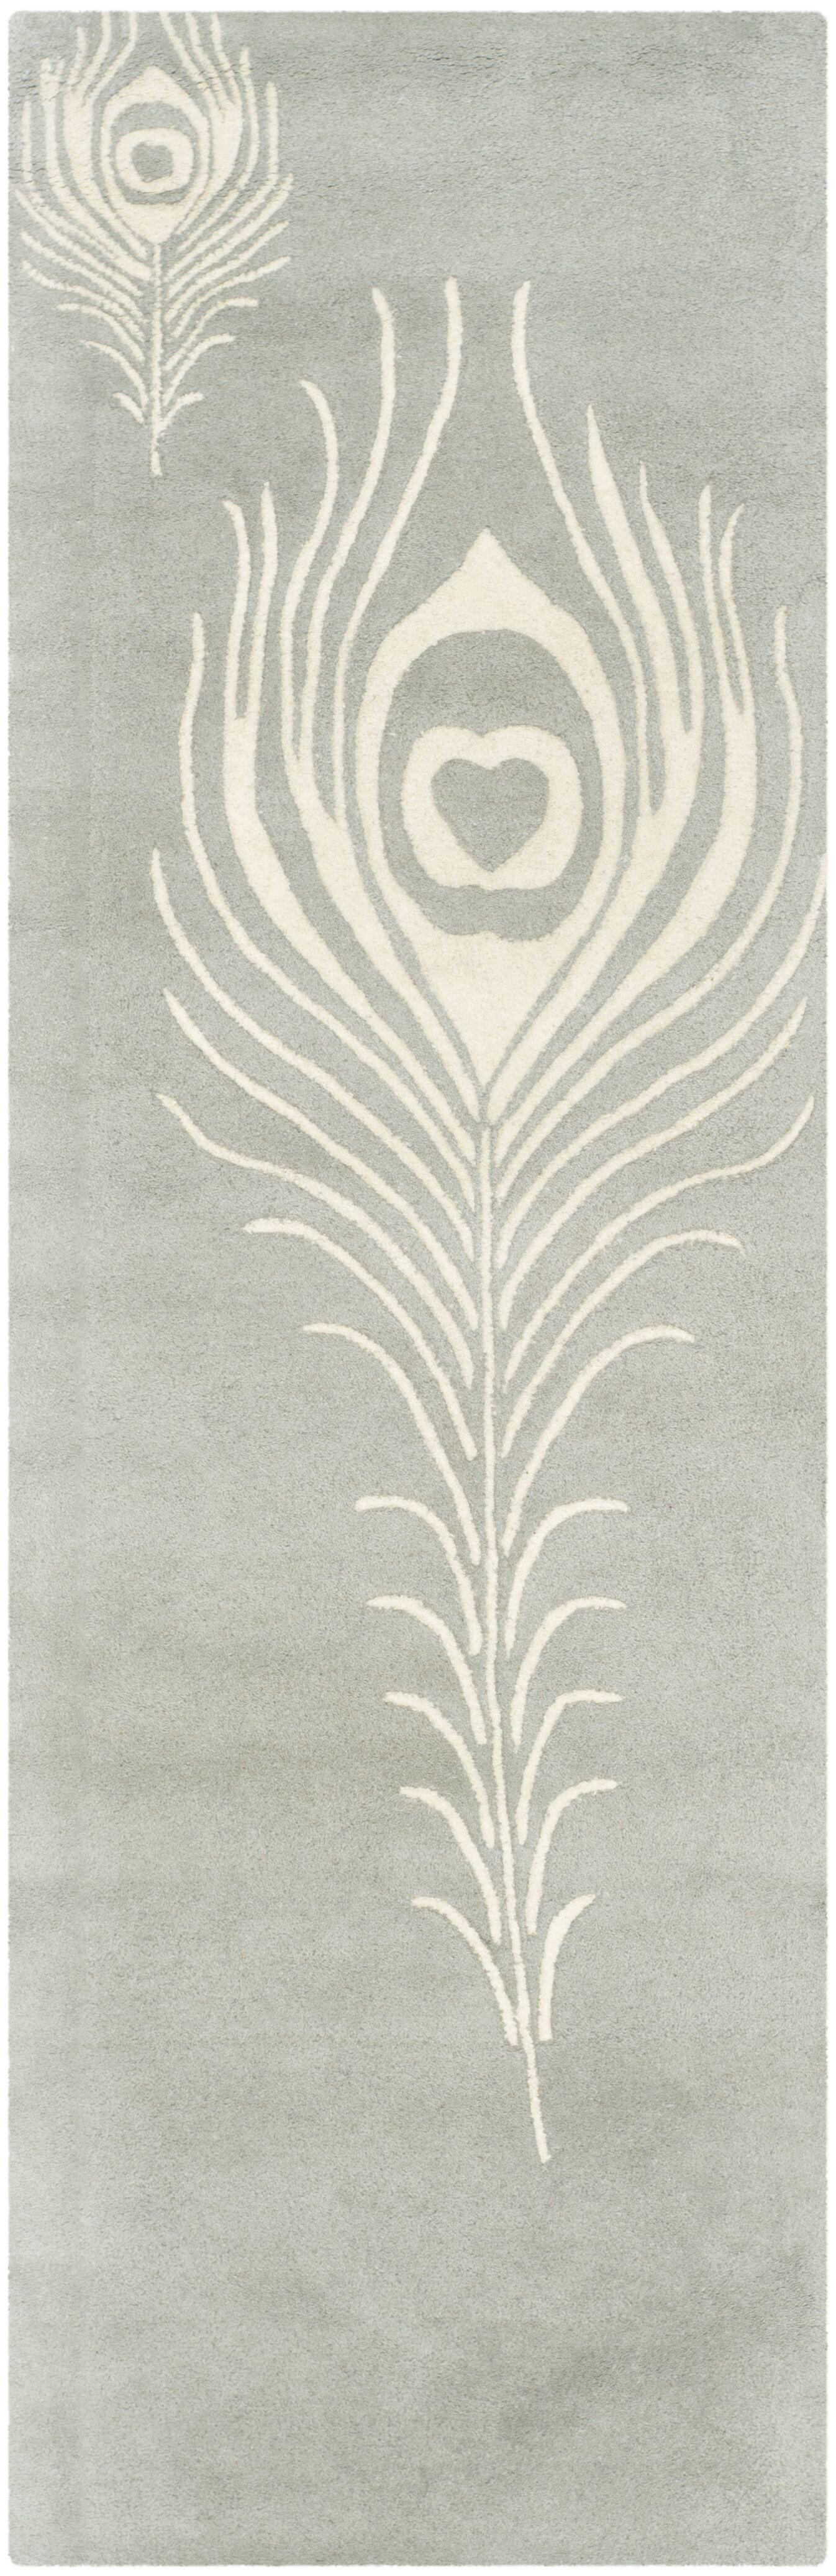 Dorthy Grey / Ivory Contemporary Rug Rug Size: Runner 2'6